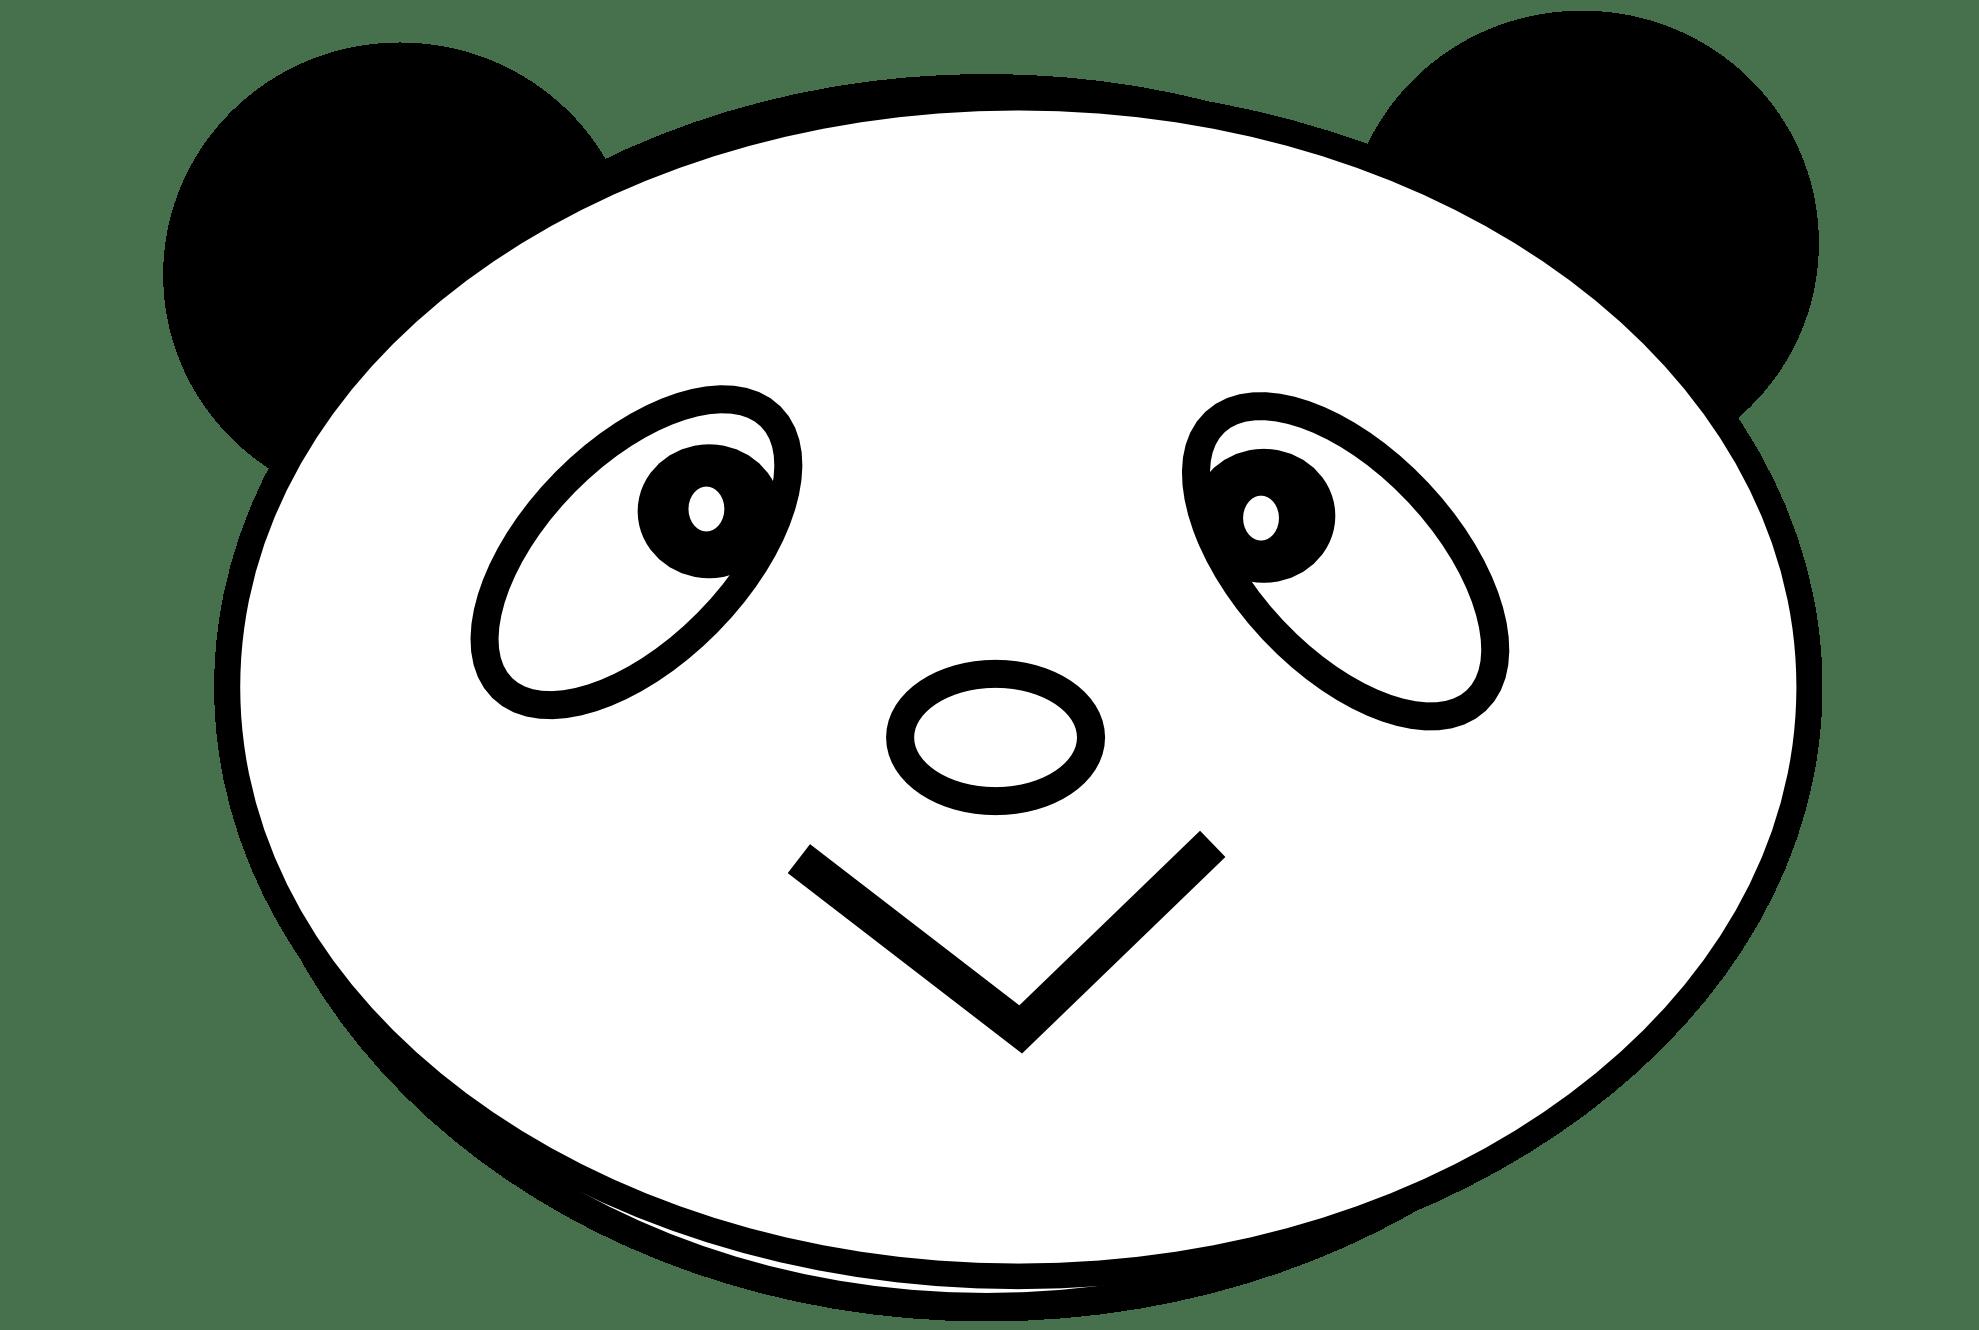 Panda Love Black White Line Teddy Bear Animal Art Coloring